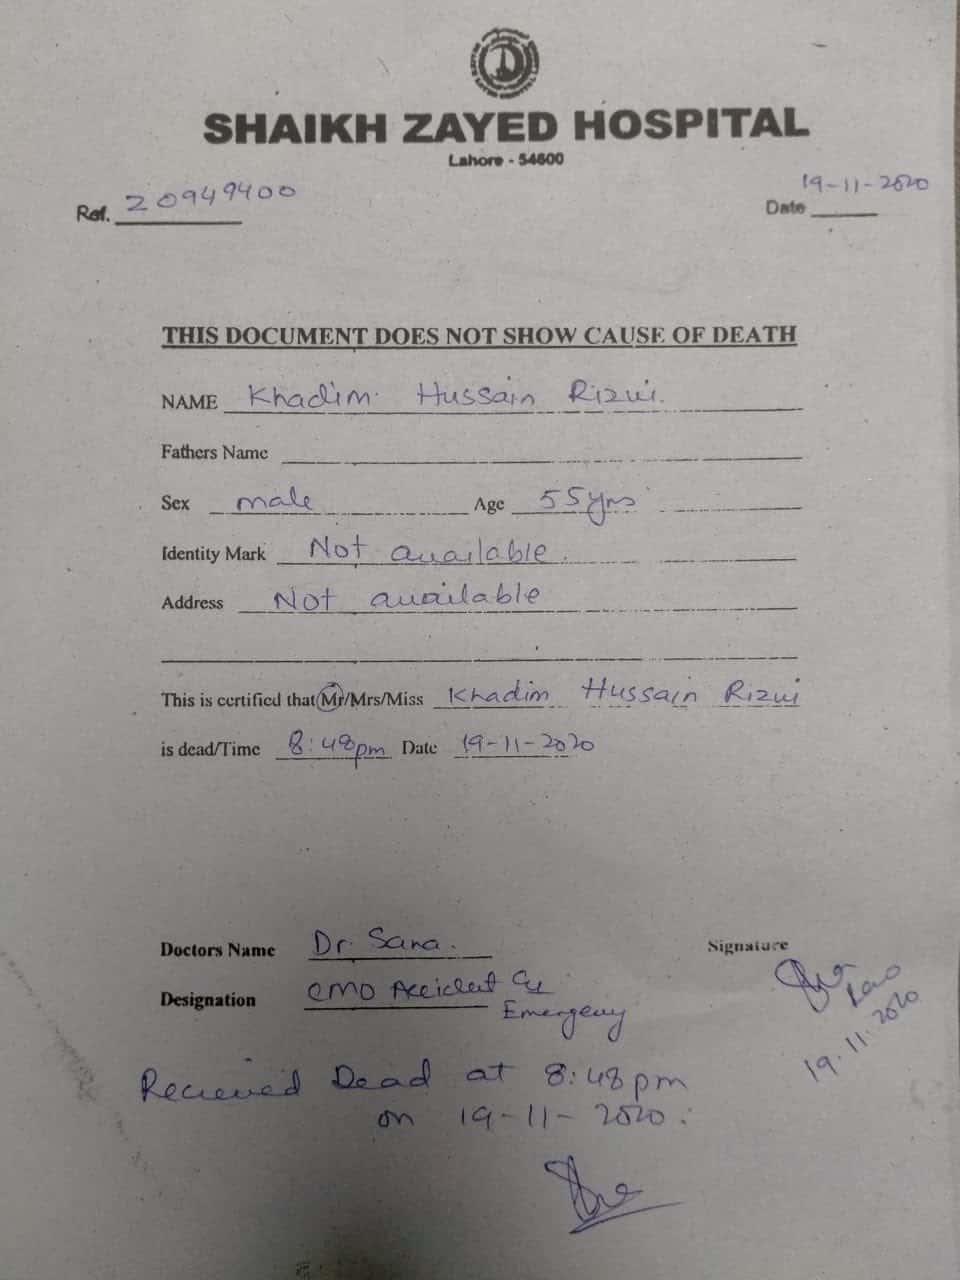 Khadim Hussain Rizvi Death Certificate alive